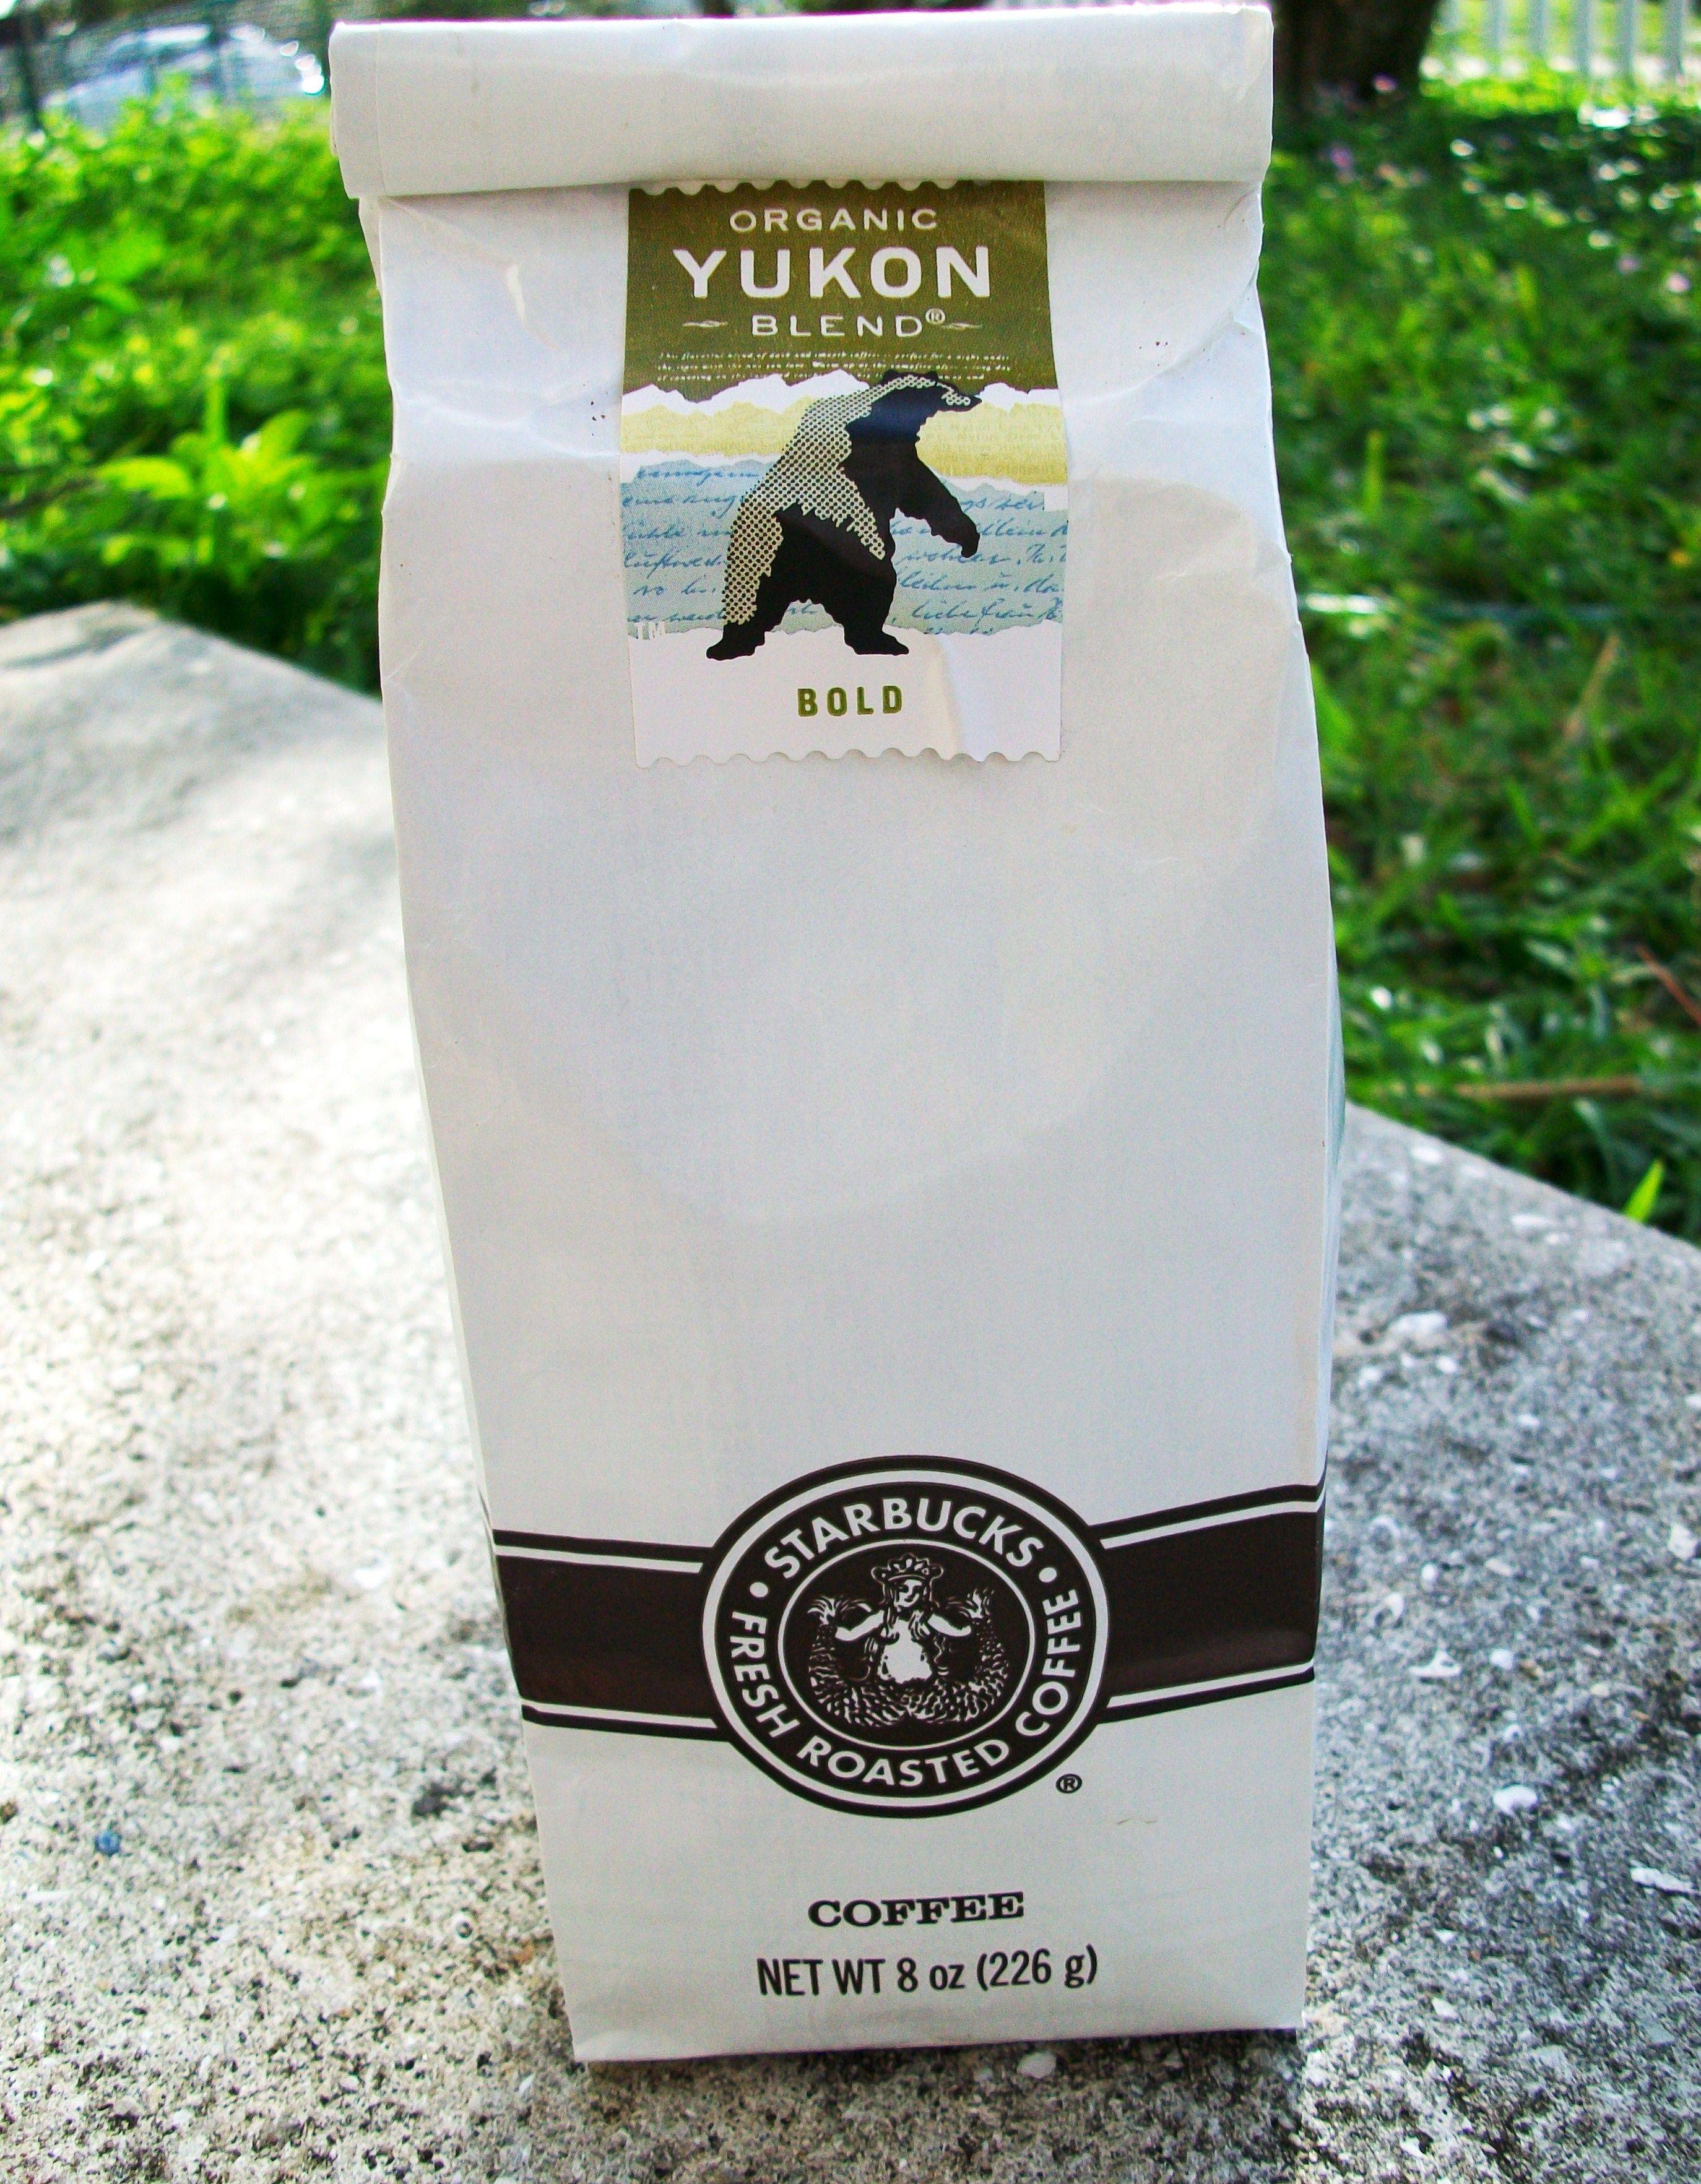 Yukon Blend Coffee packaging, Coffee company, Starbucks